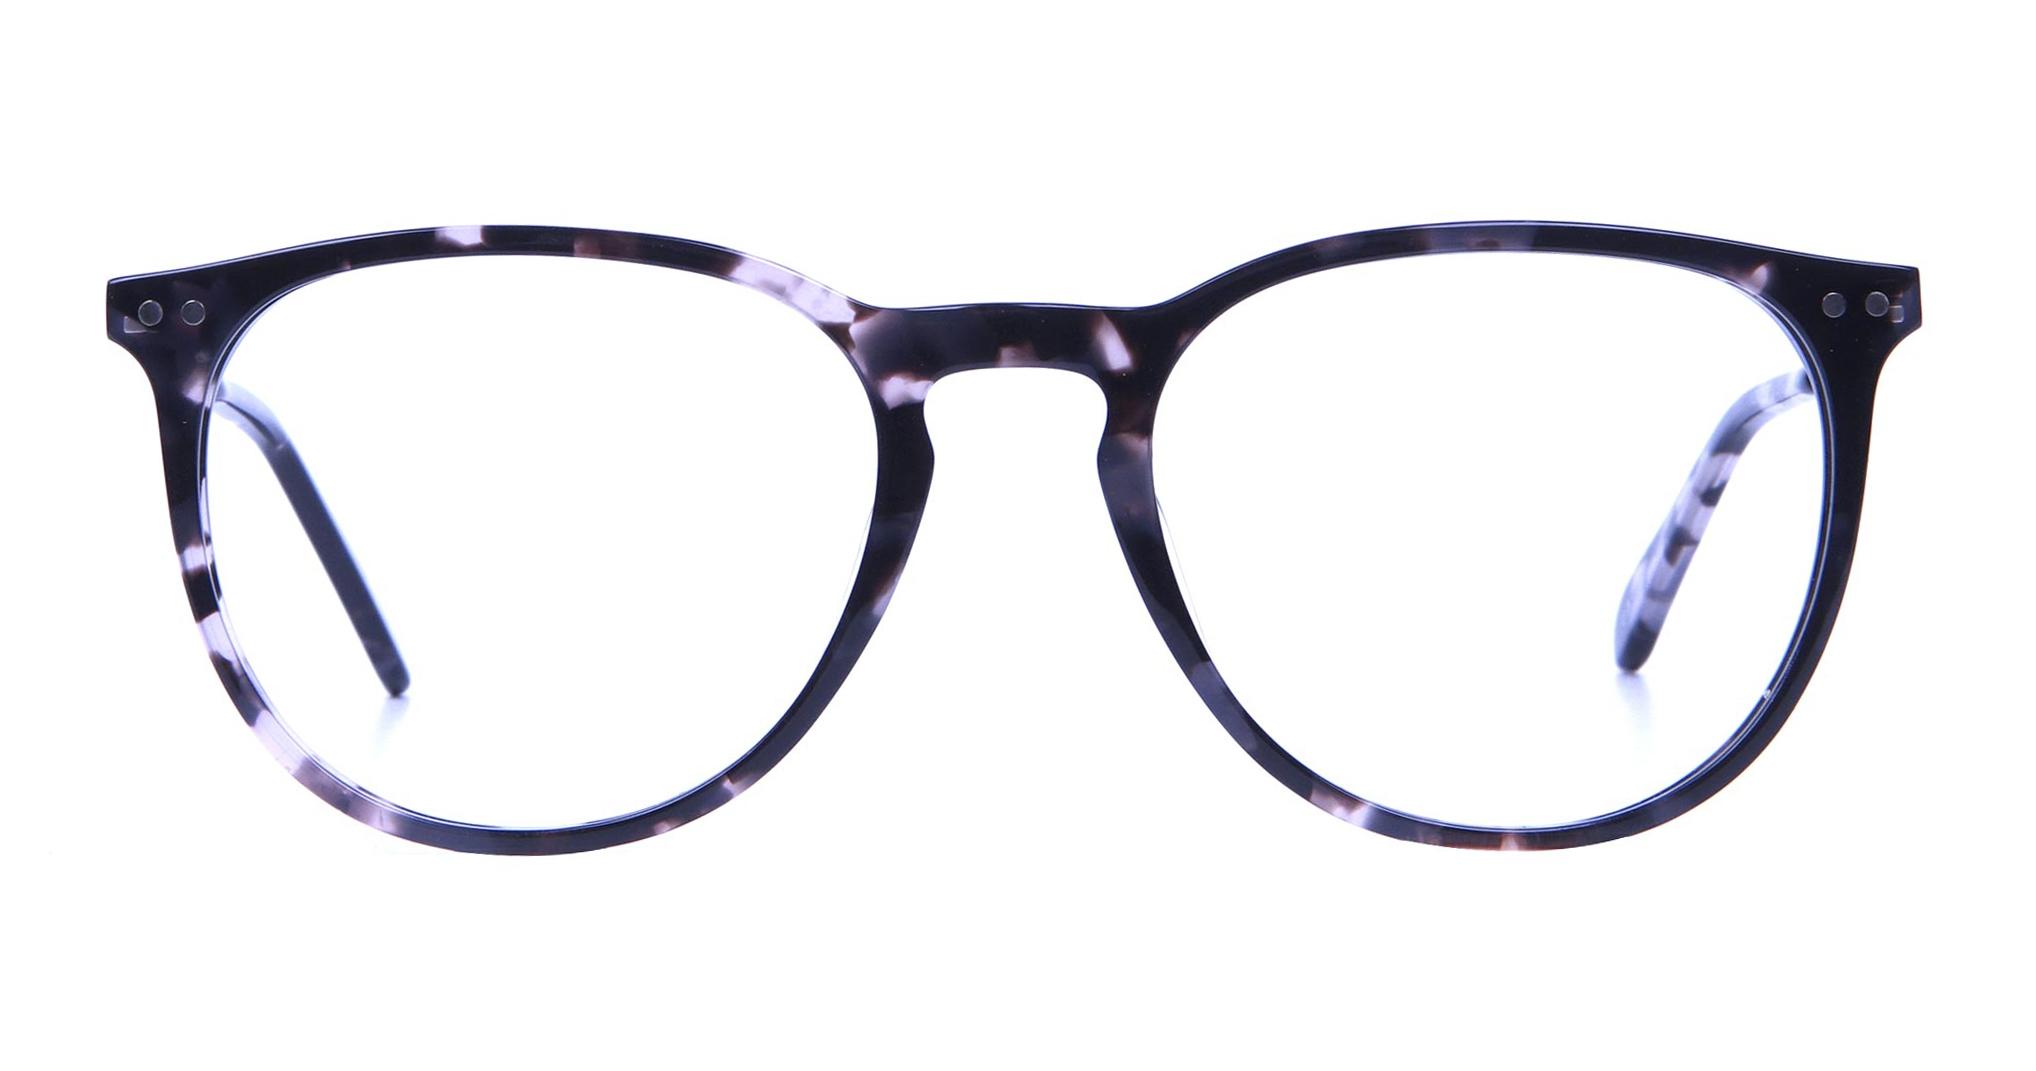 Black and Grey Tortoiseshell Glasses